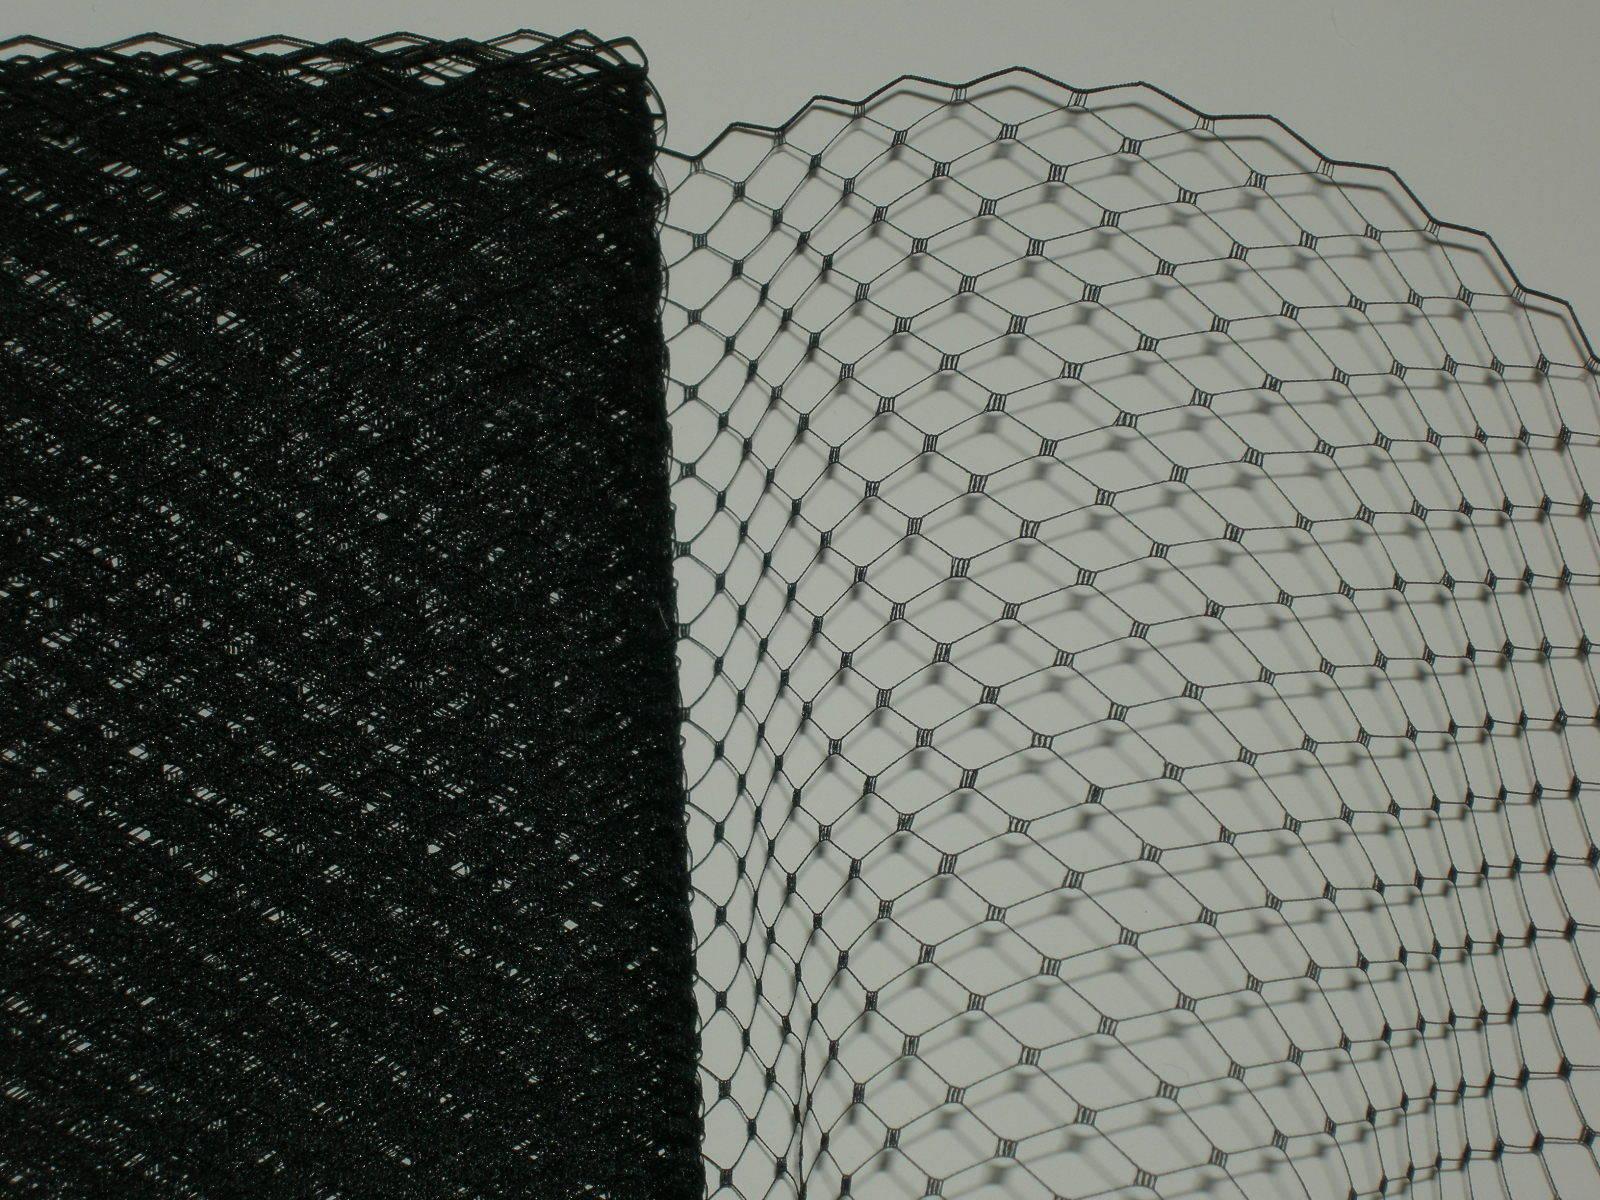 Black bird cage hat veil netting french birdcage net 1+